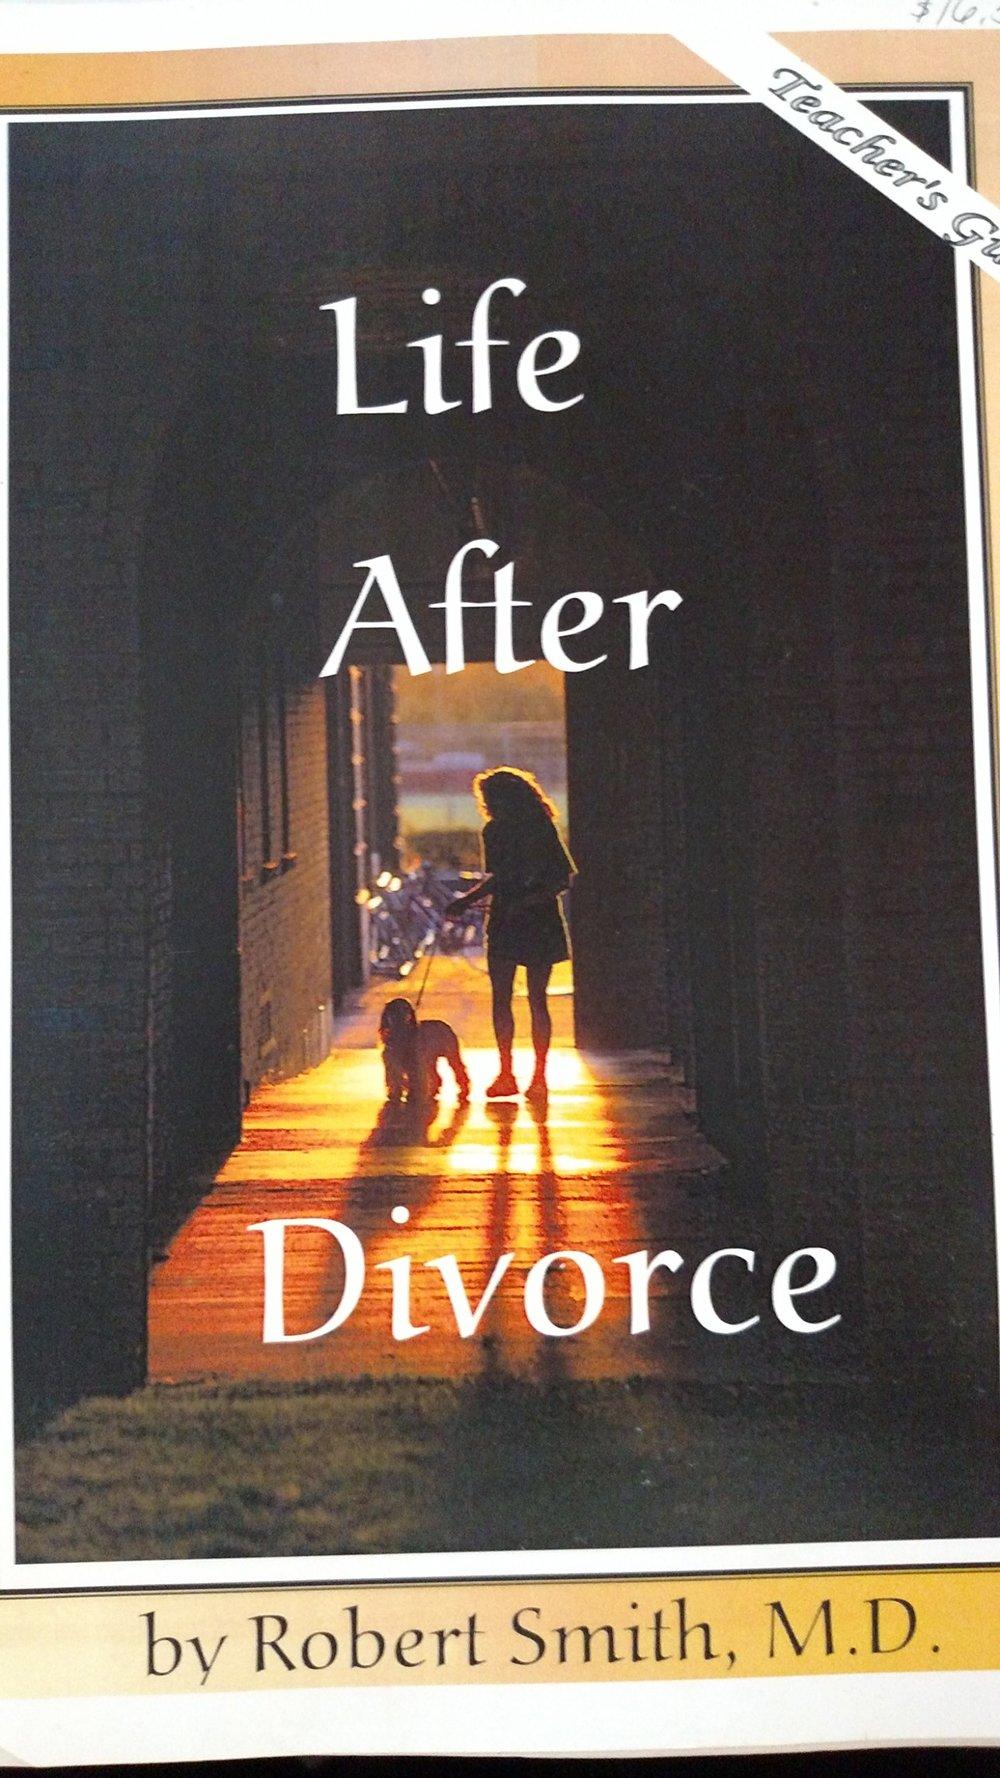 Life After Divorce - Robert Smith, M.D.